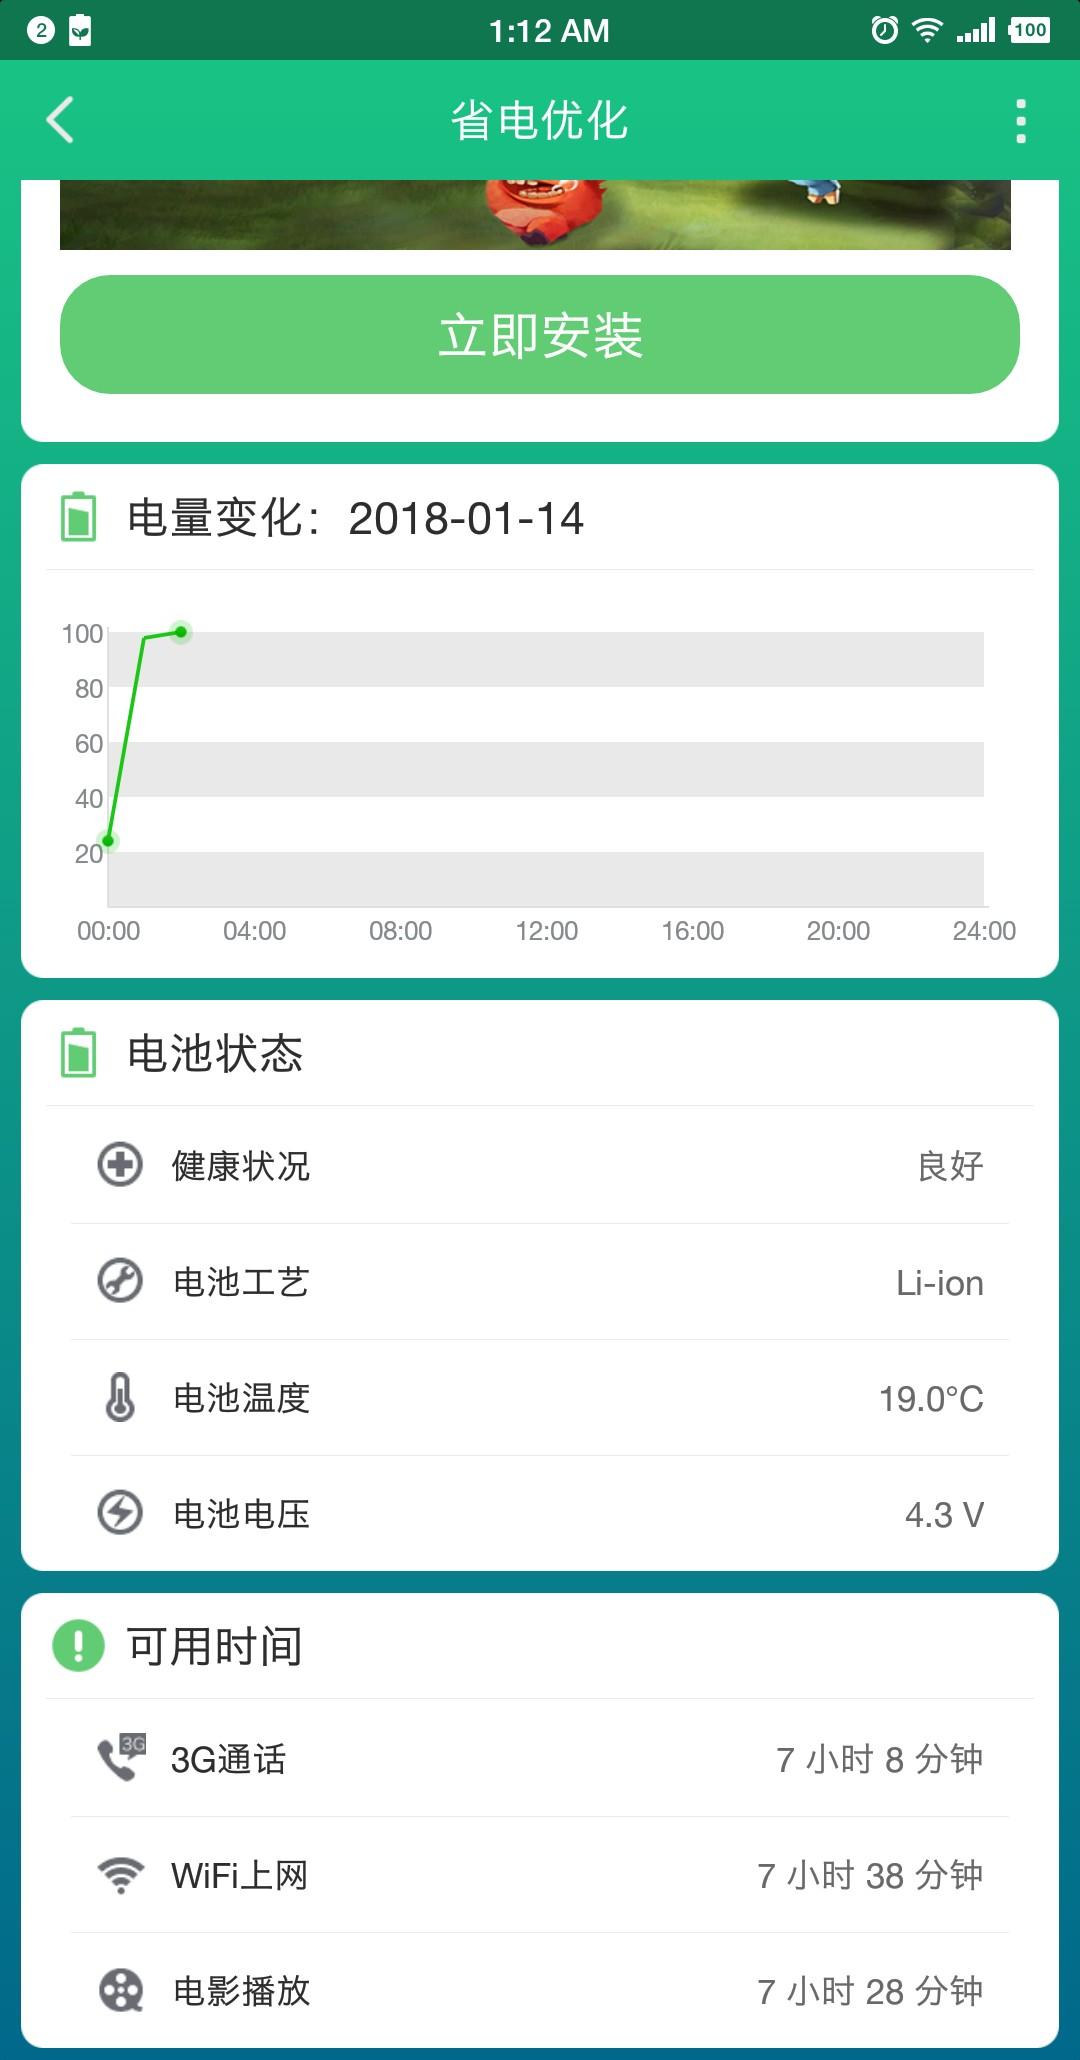 Screenshot_2018-01-14-01-12-25-876_??????.png